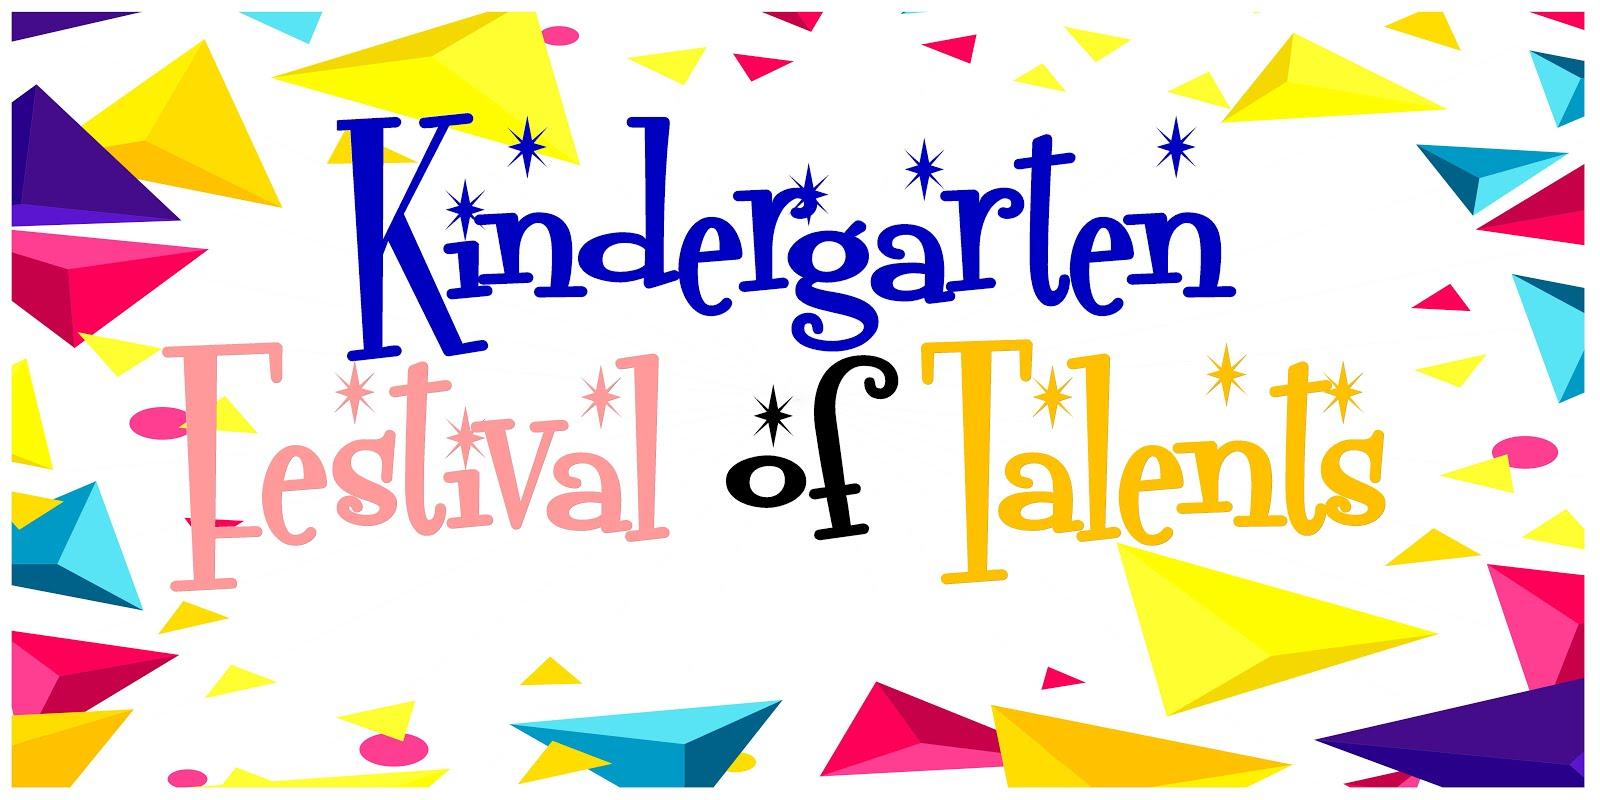 Kindergarten Festival Backdrop